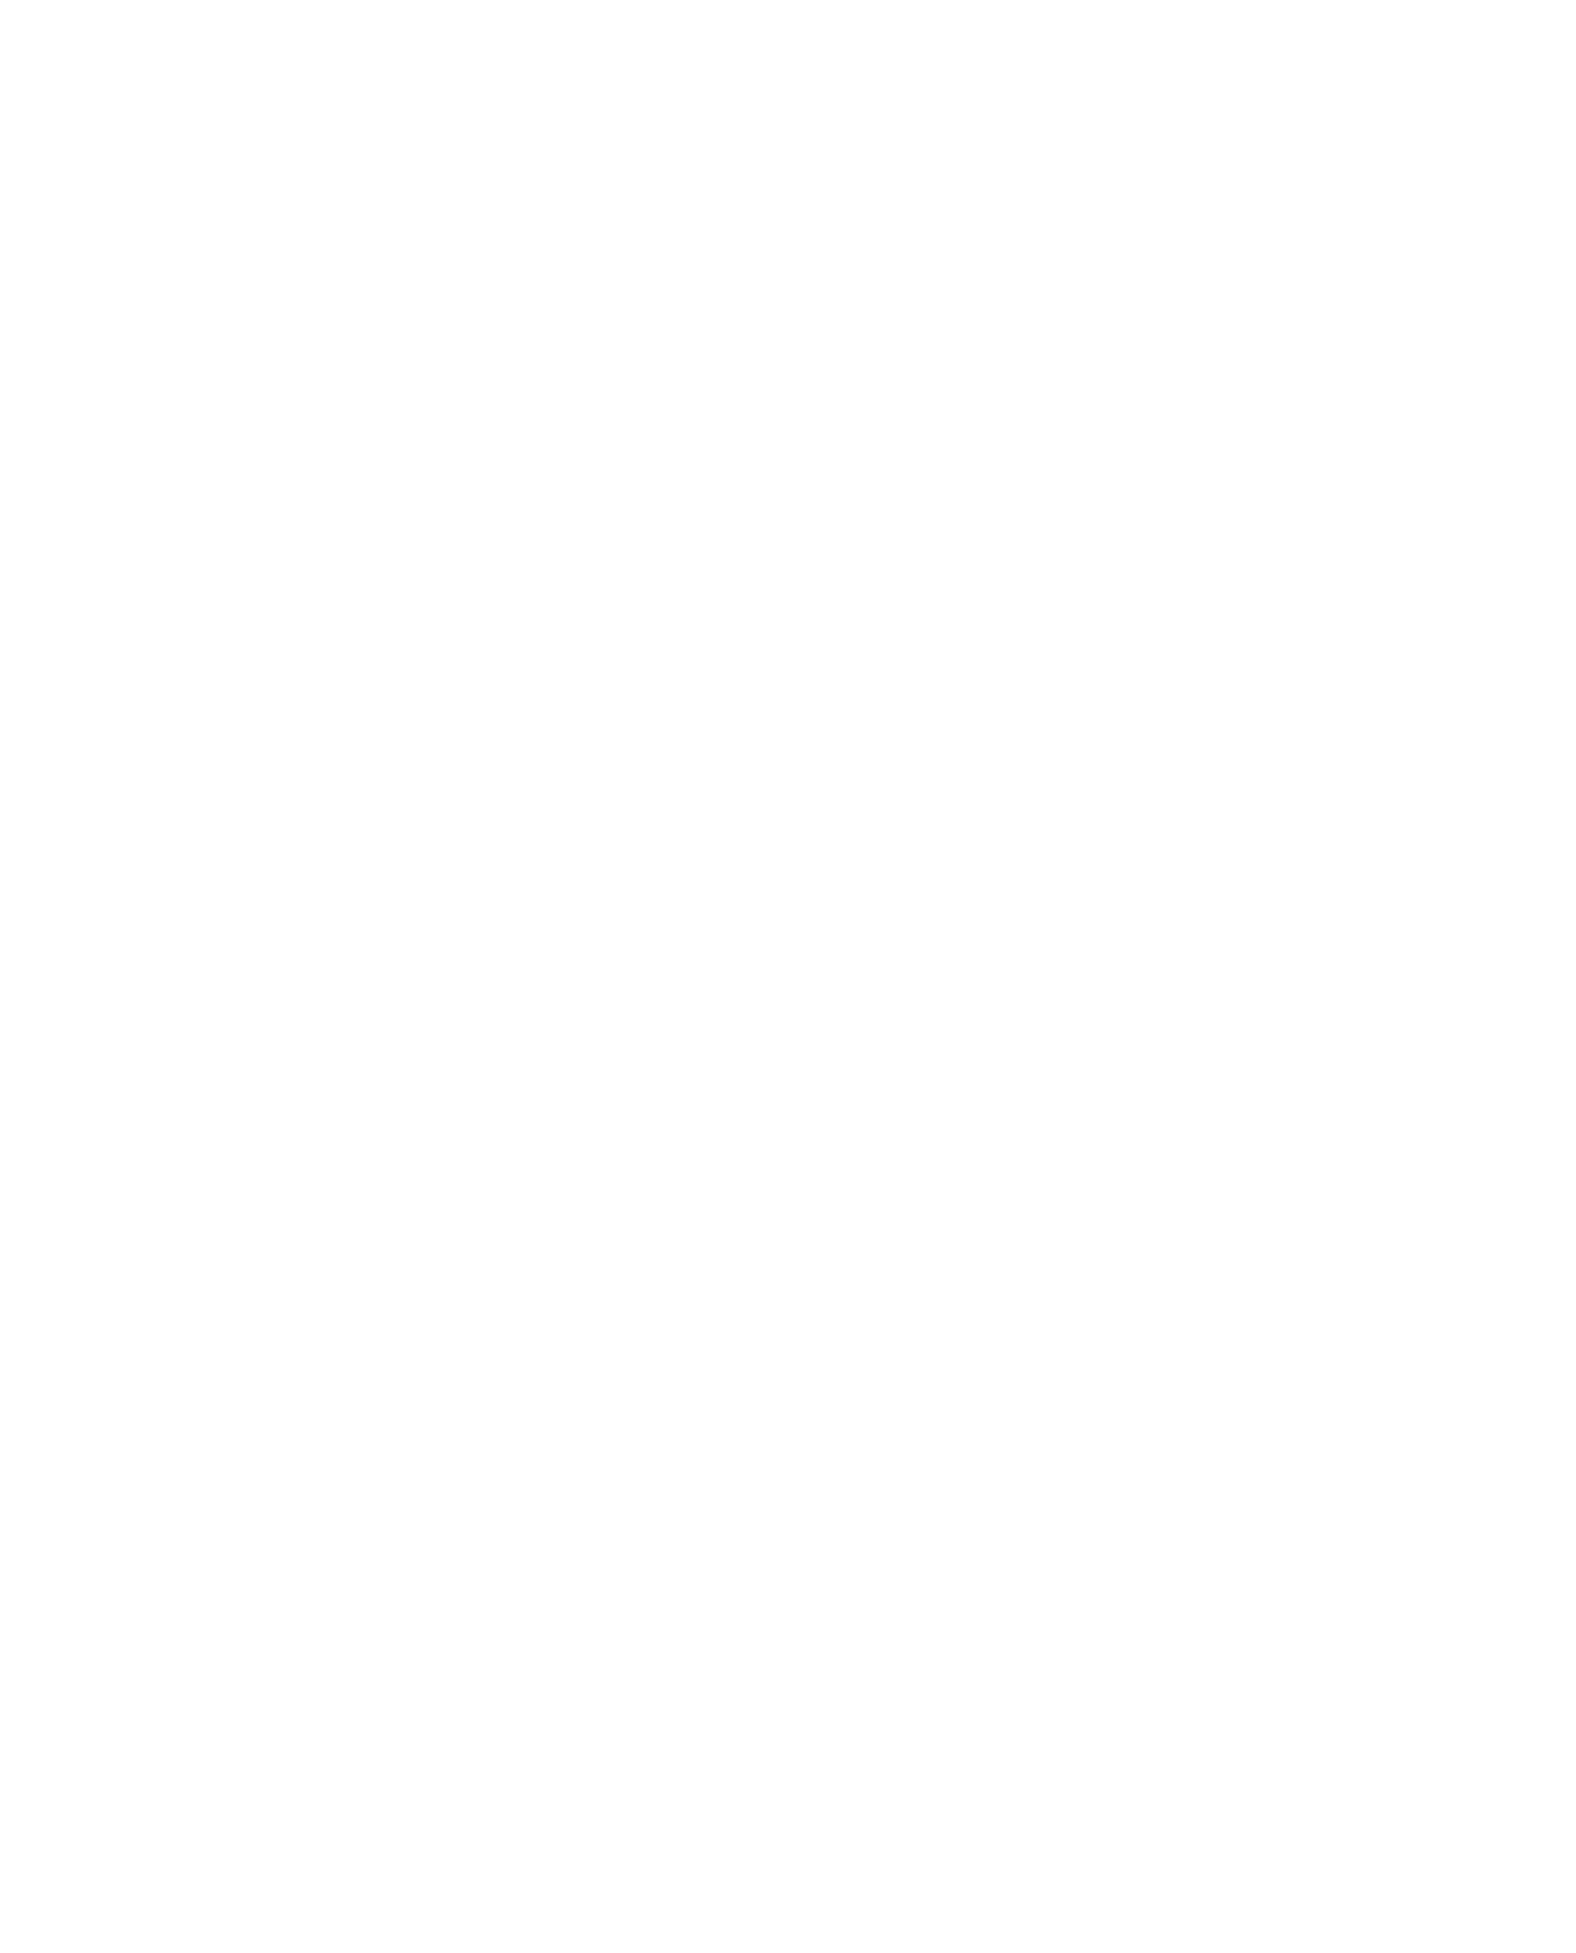 5 канал Украина (2003-2005)